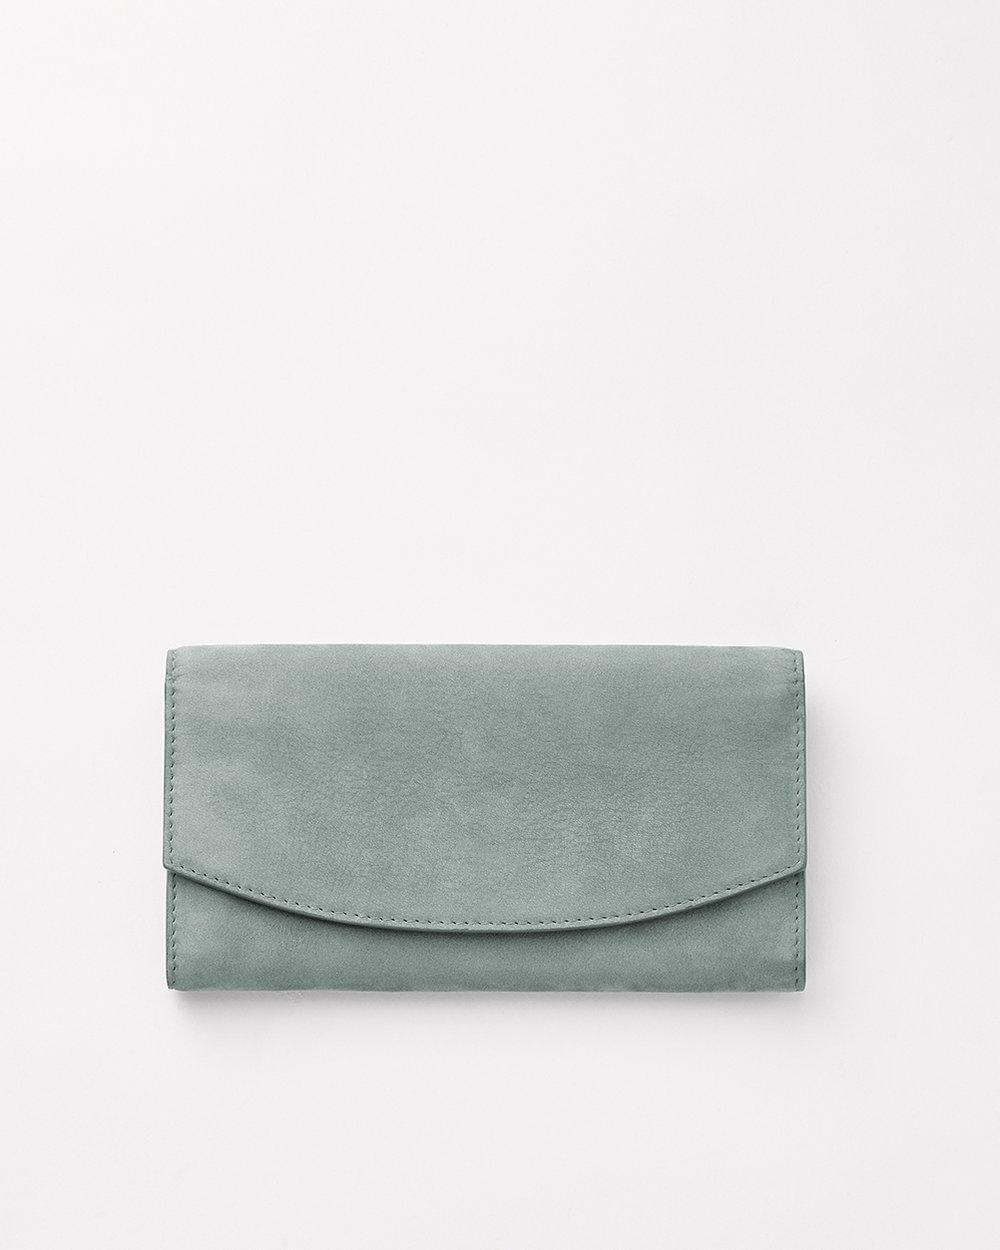 flap wallet chambray.jpg